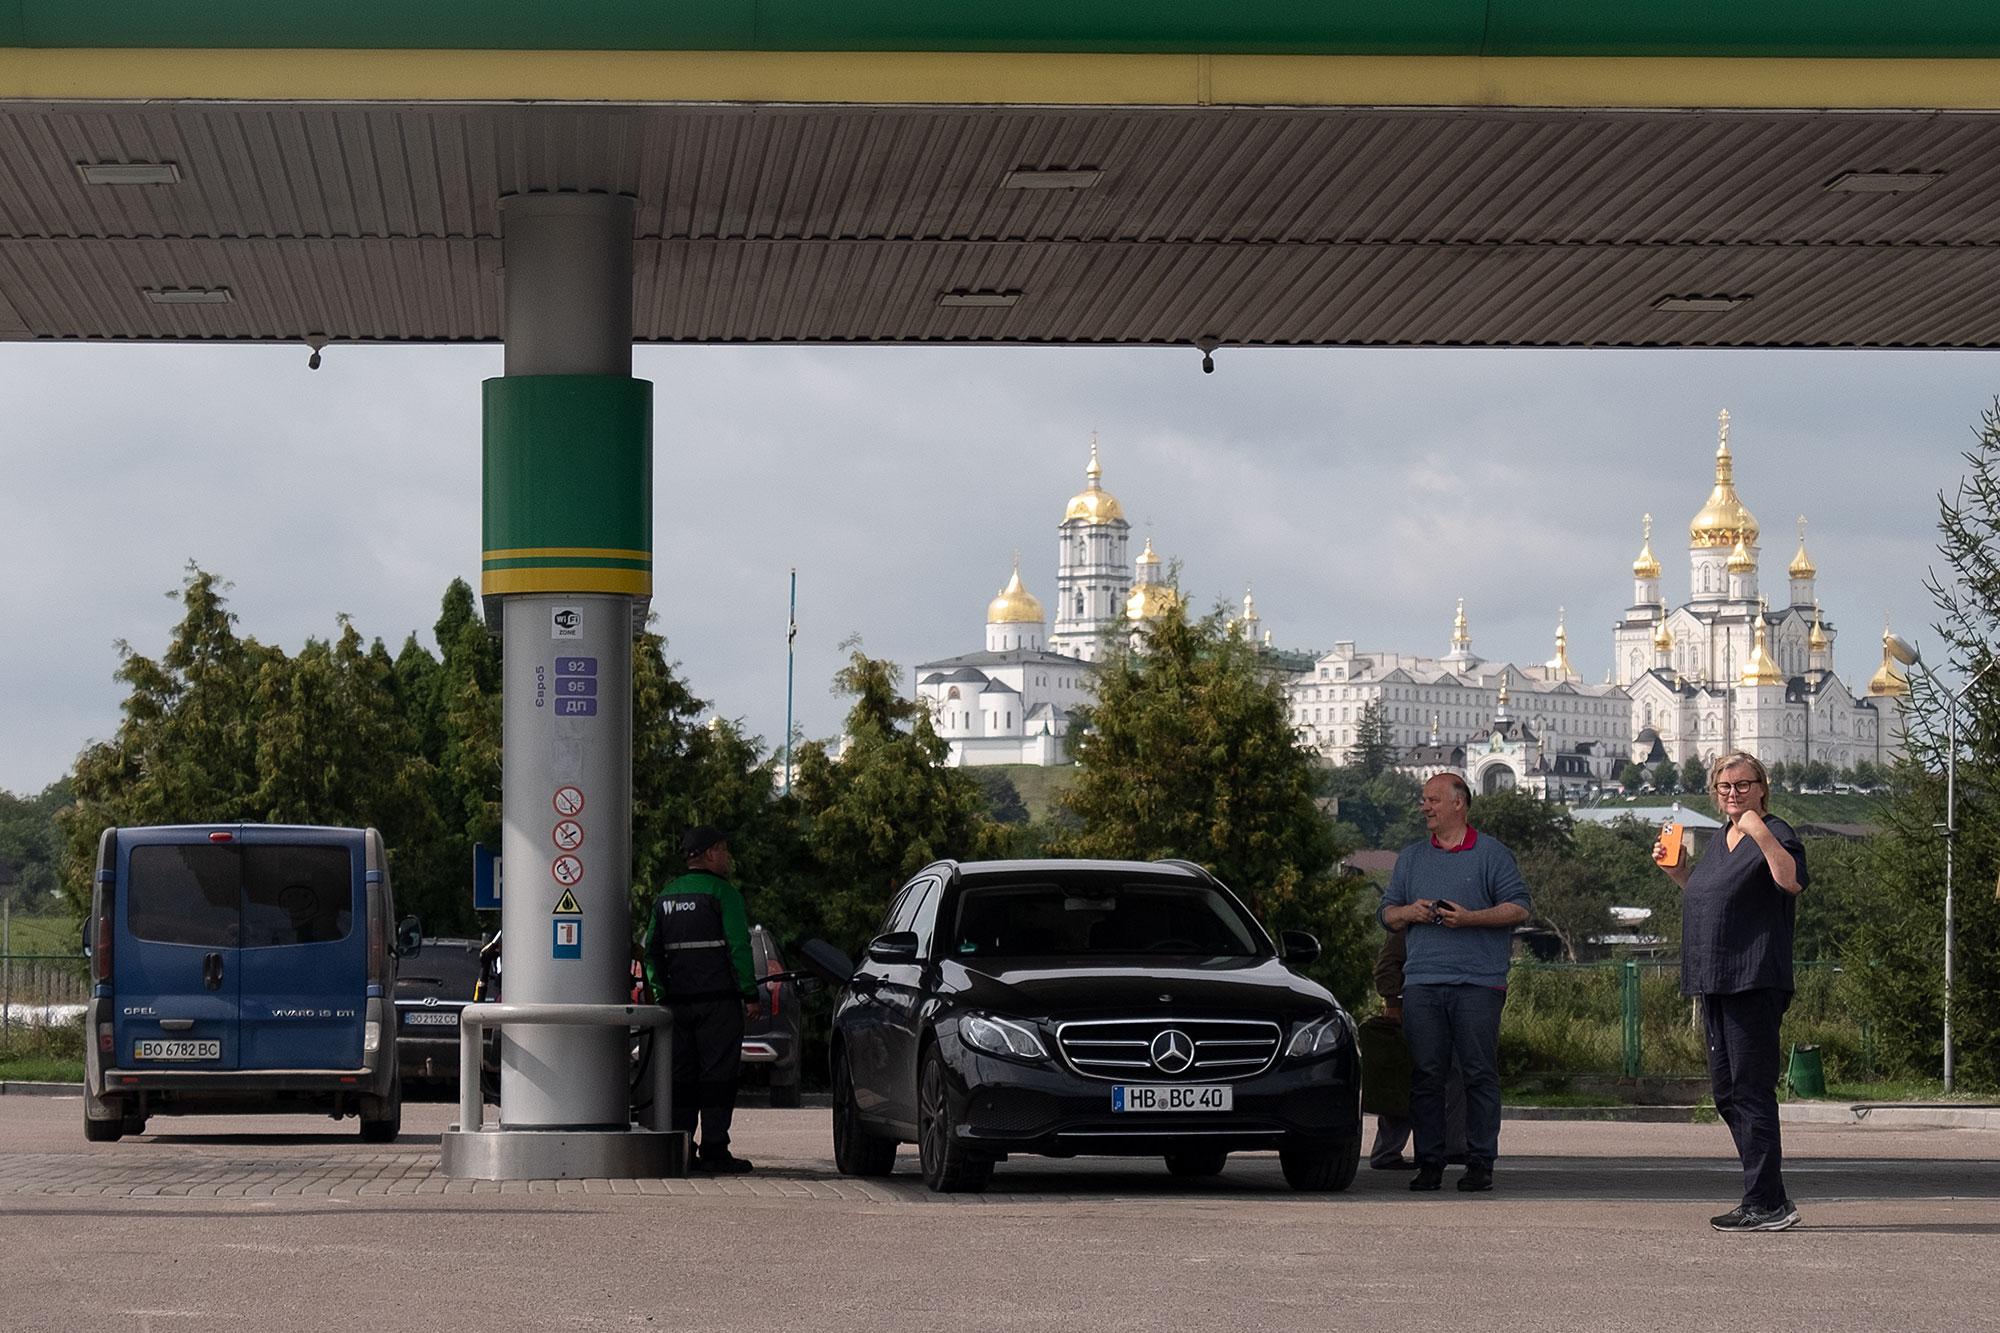 Pochaiv - Break at a gas station